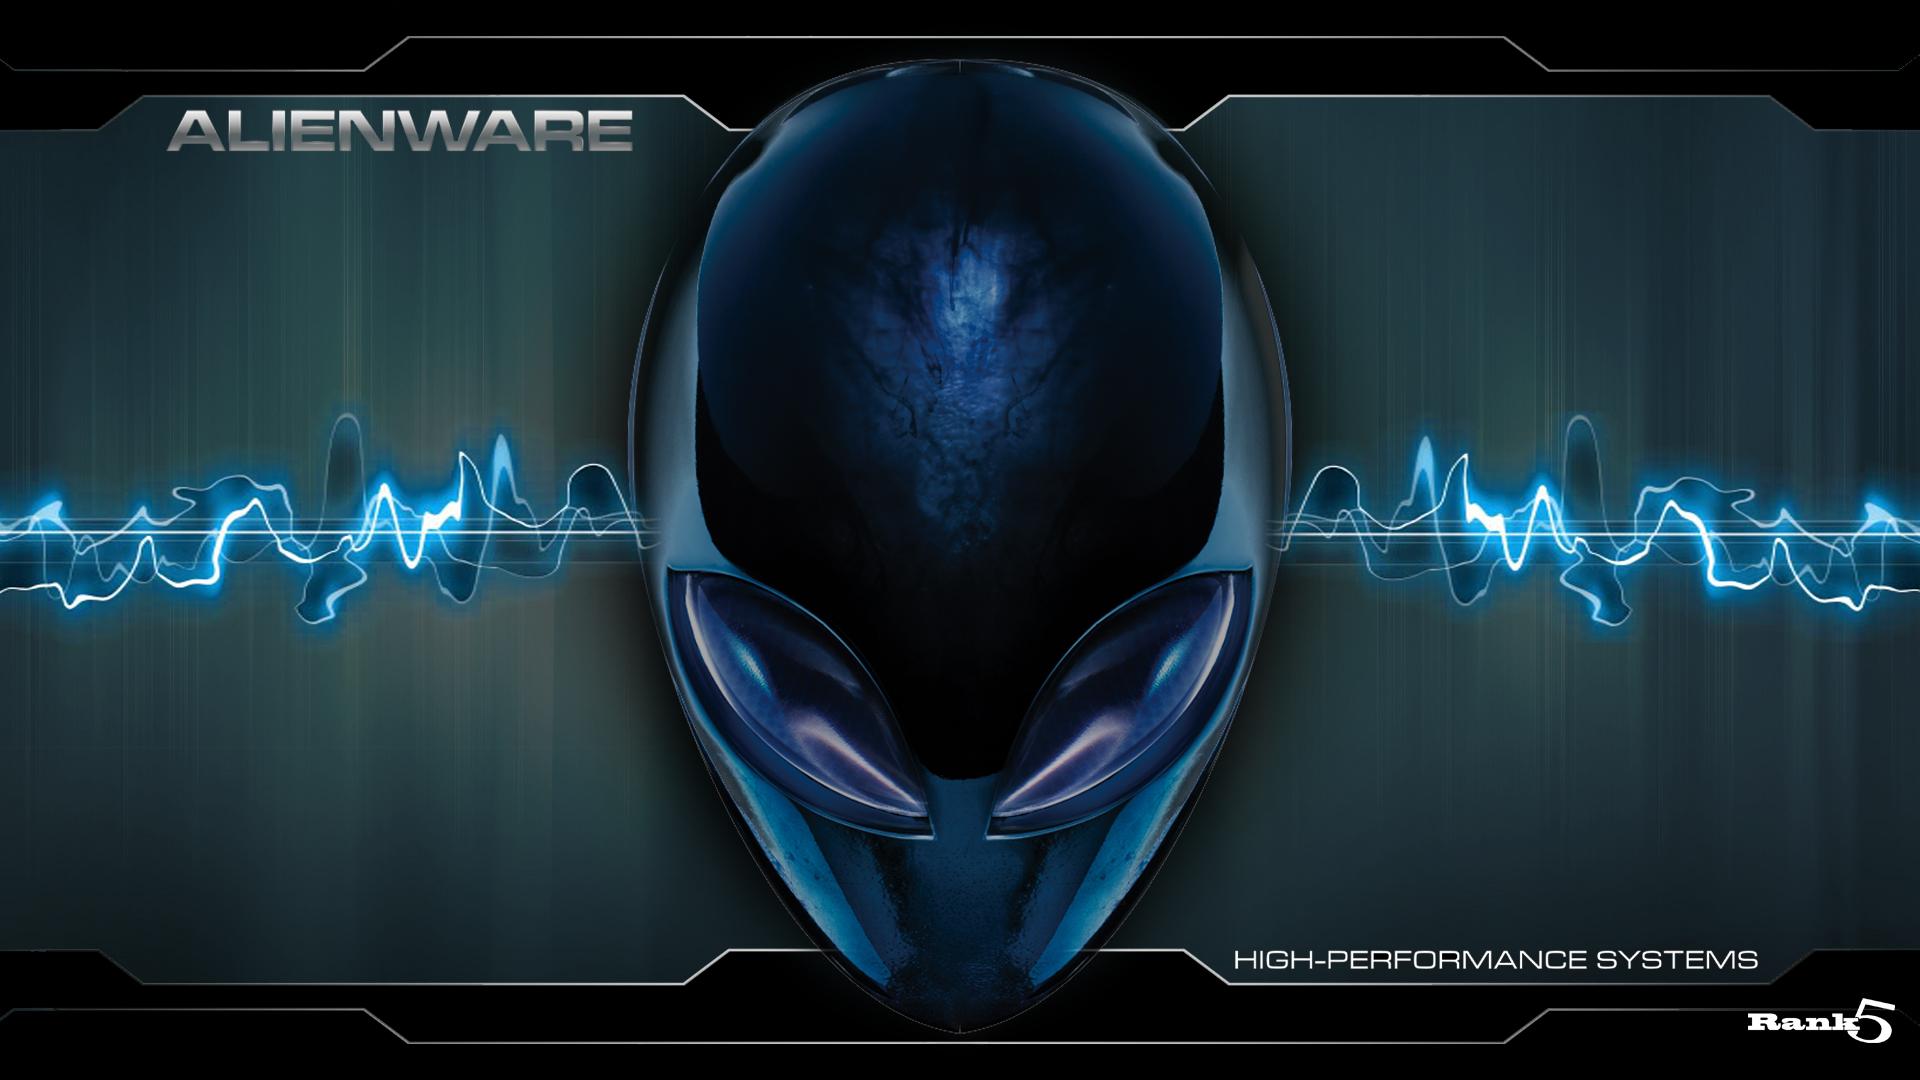 Rather alienware desktop themes final